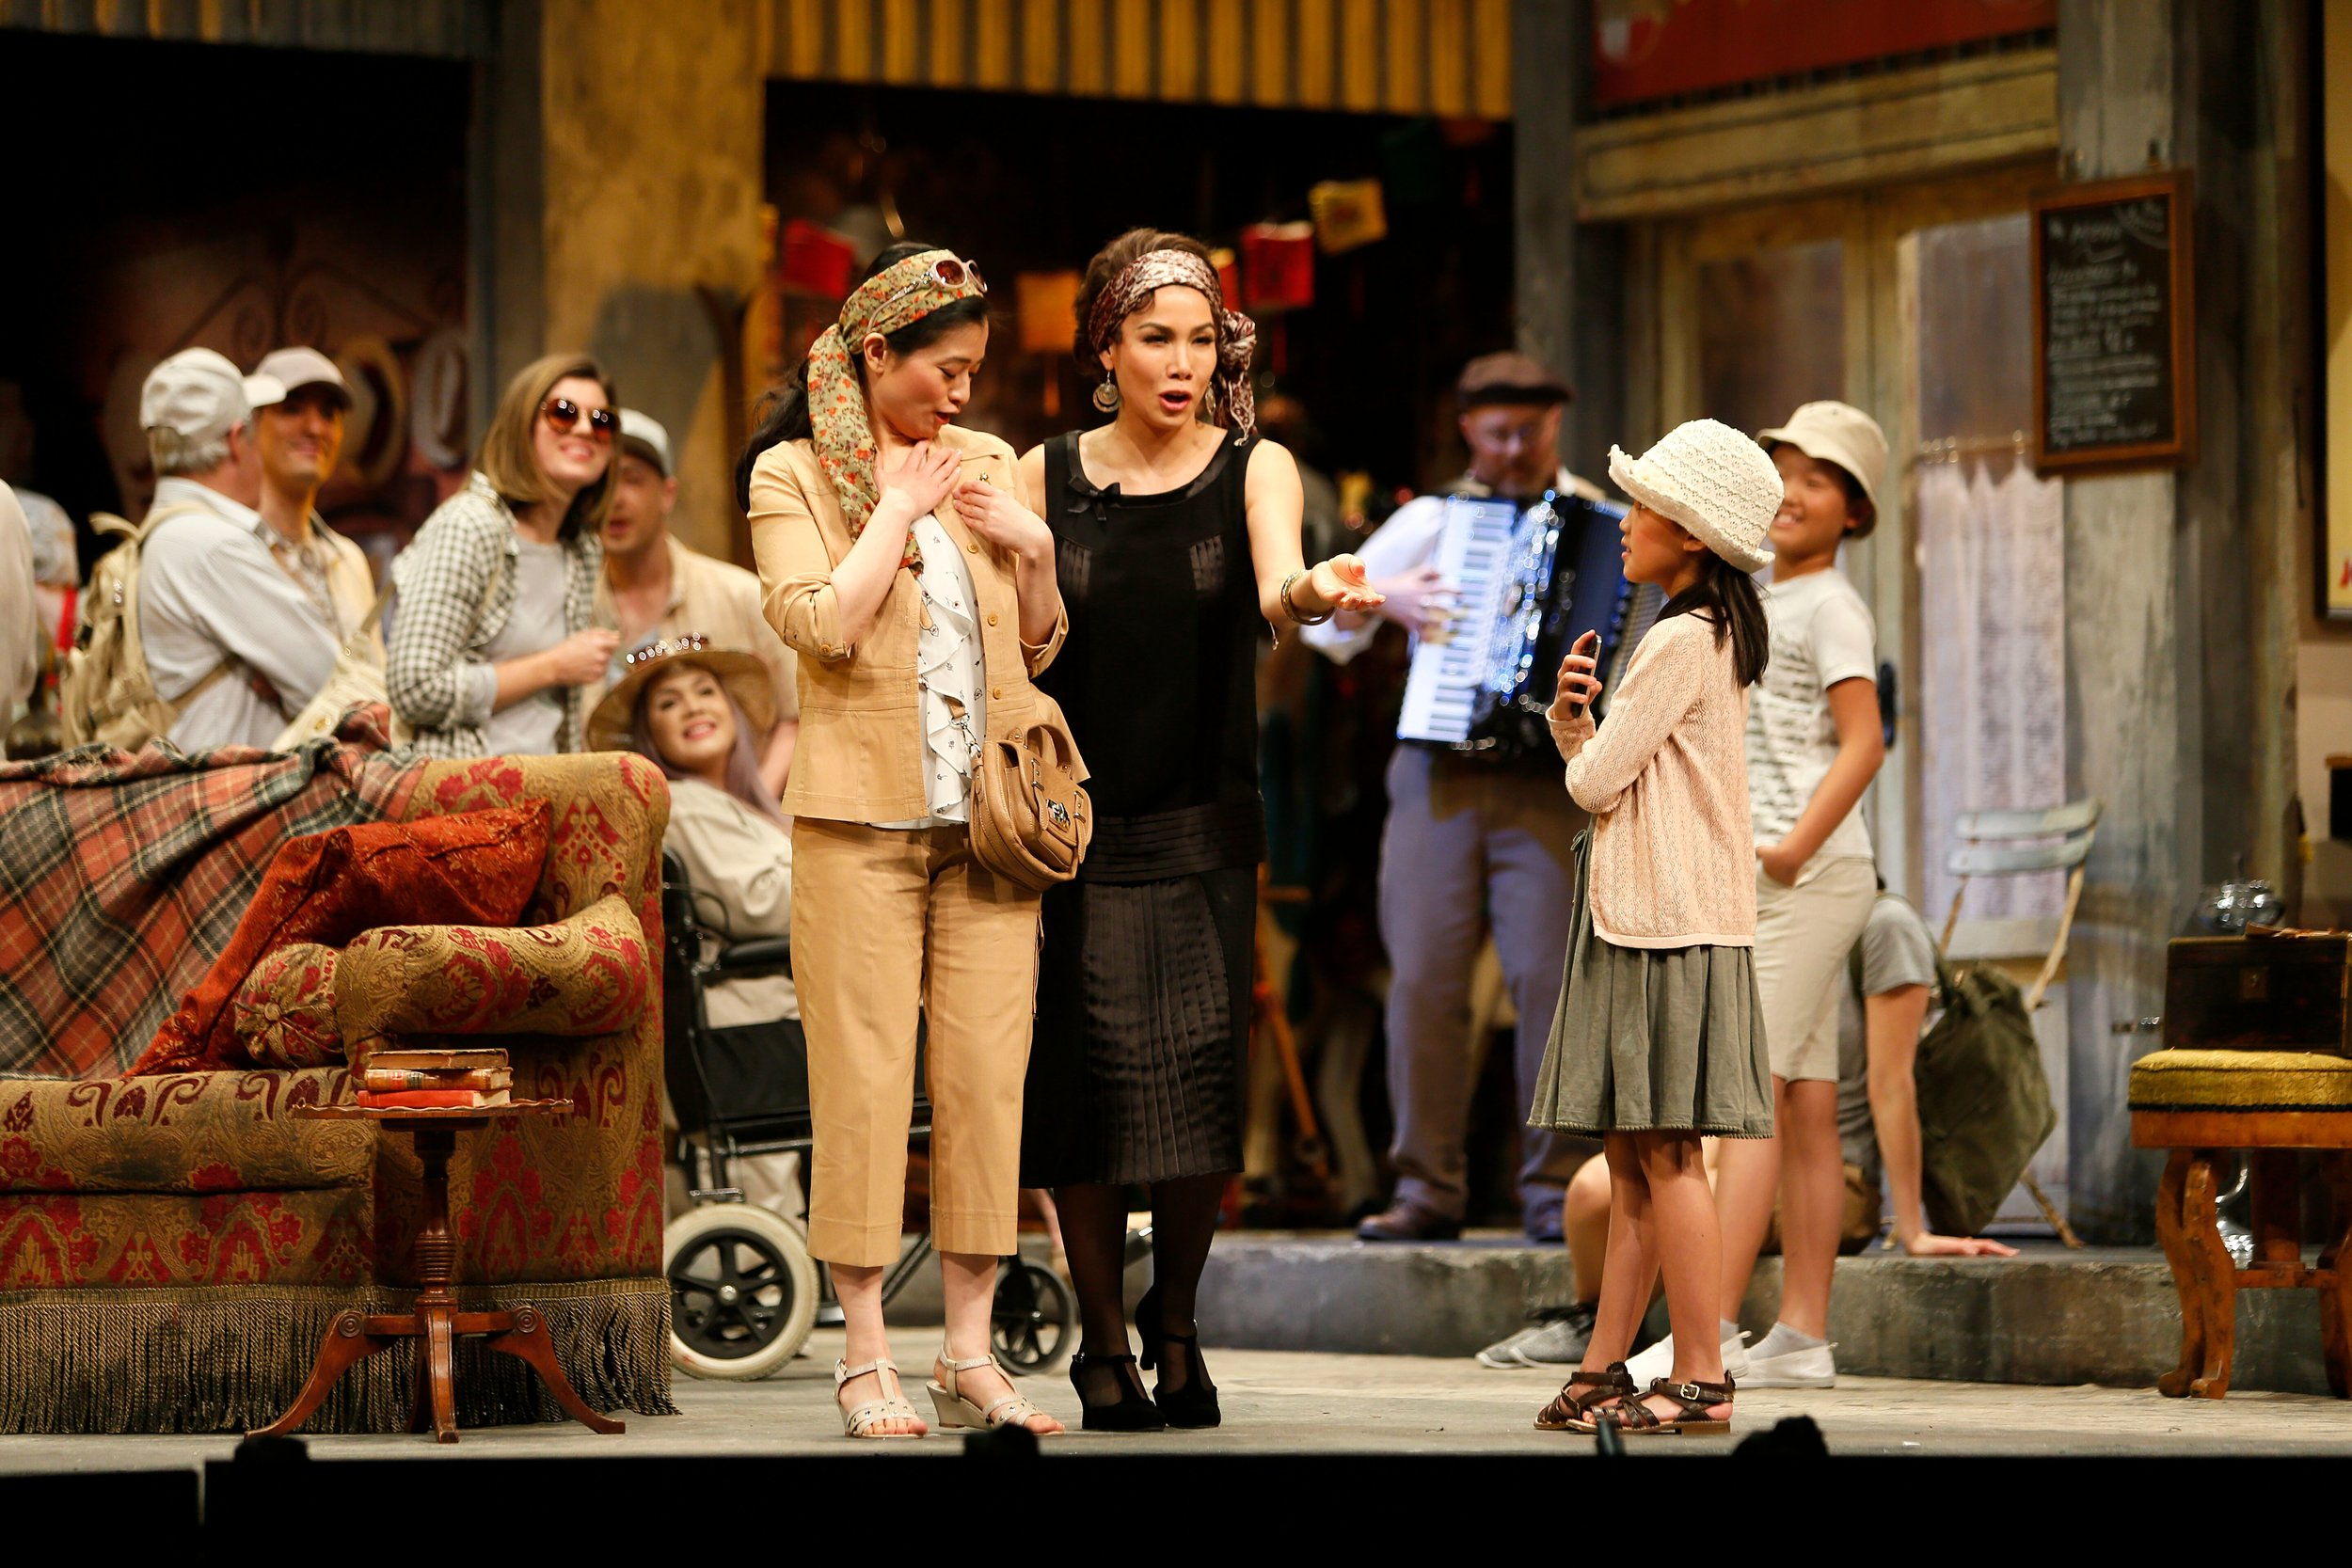 Vancouver Opera's prologue scene. Photo credit: Tim Matheson